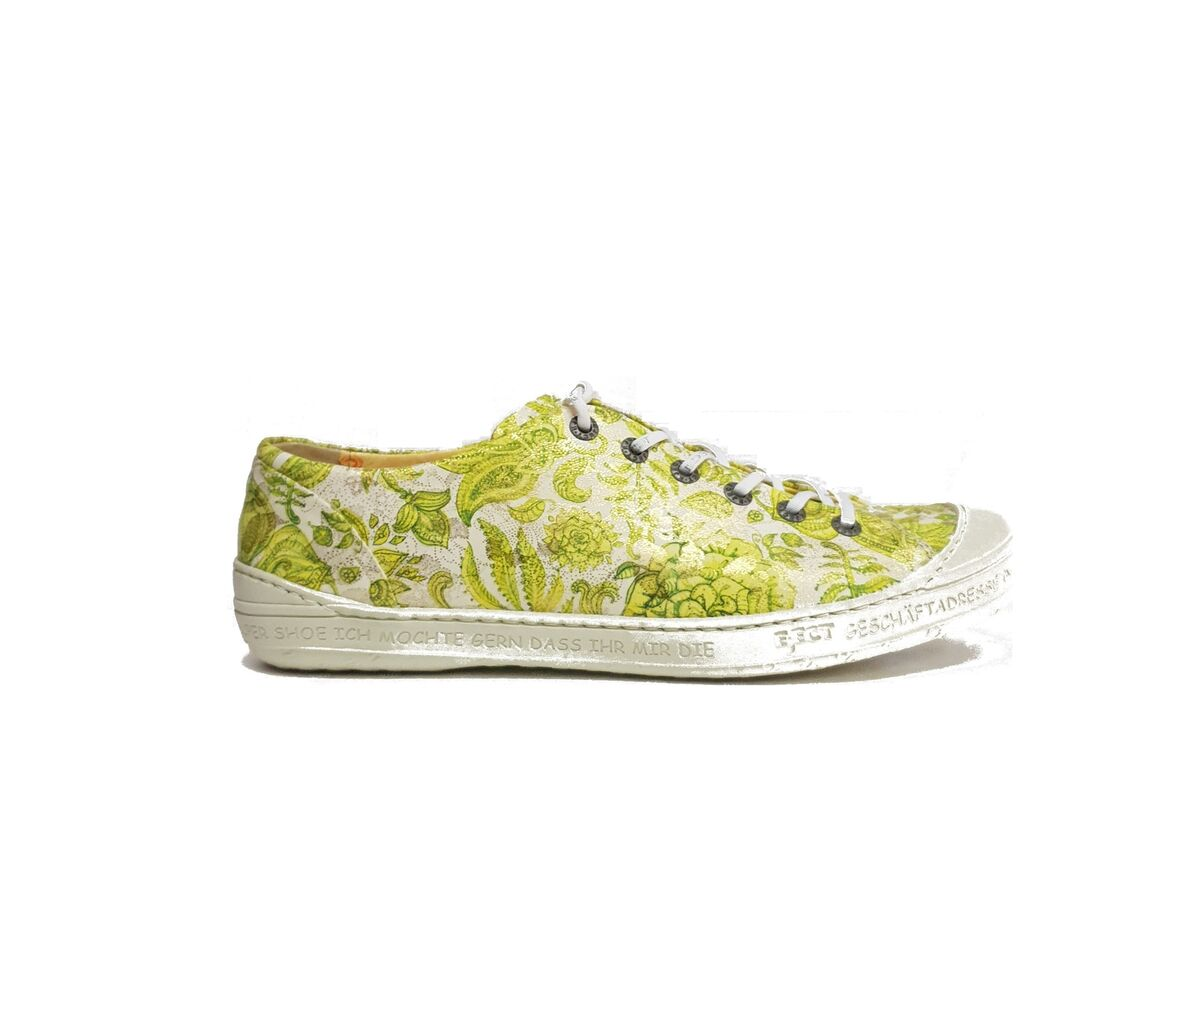 theabbeyfootwear